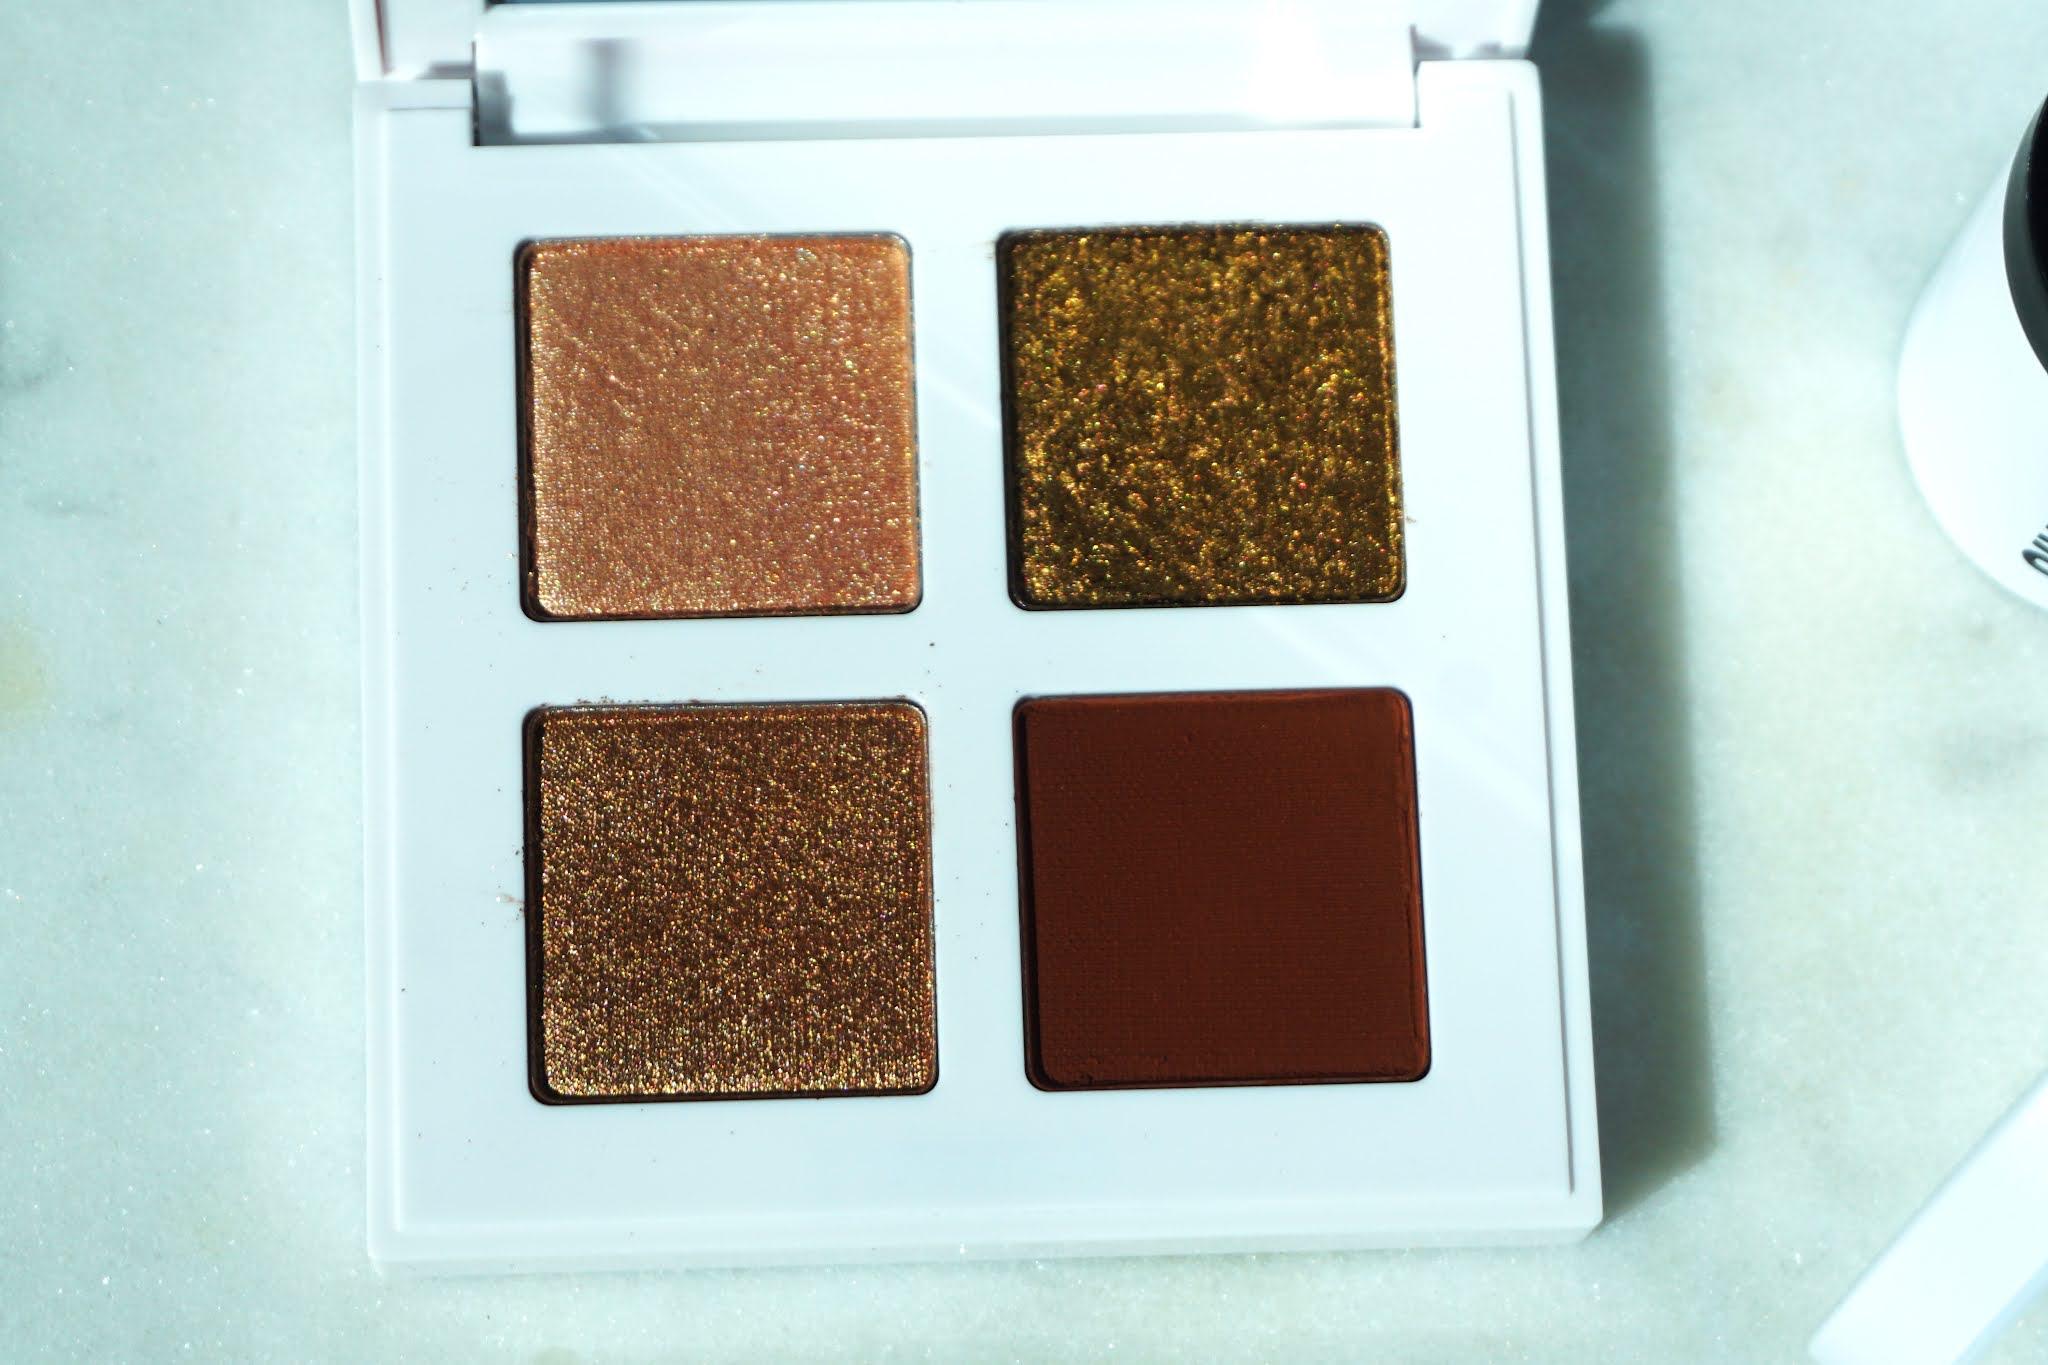 Makeup by Mario Glam Eyeshadow Quad Bronzy Glam